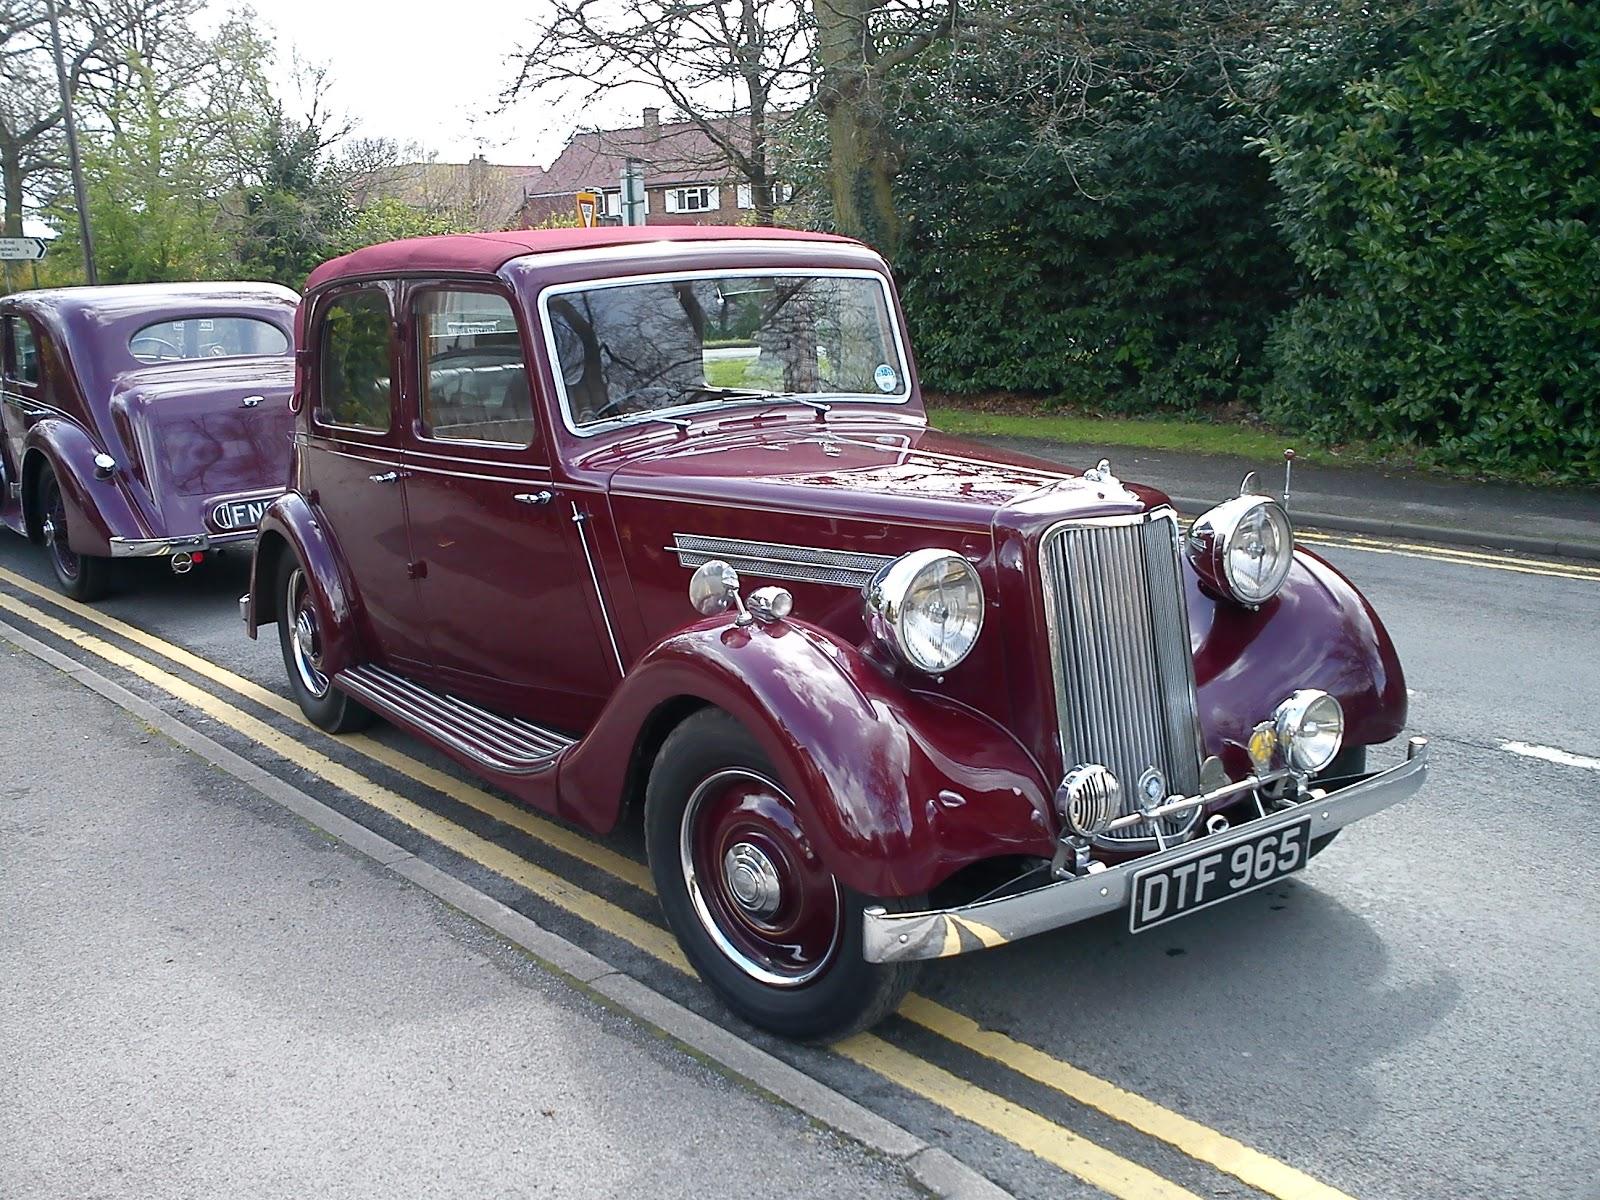 Classic Cars in Balsall Common, U.K.